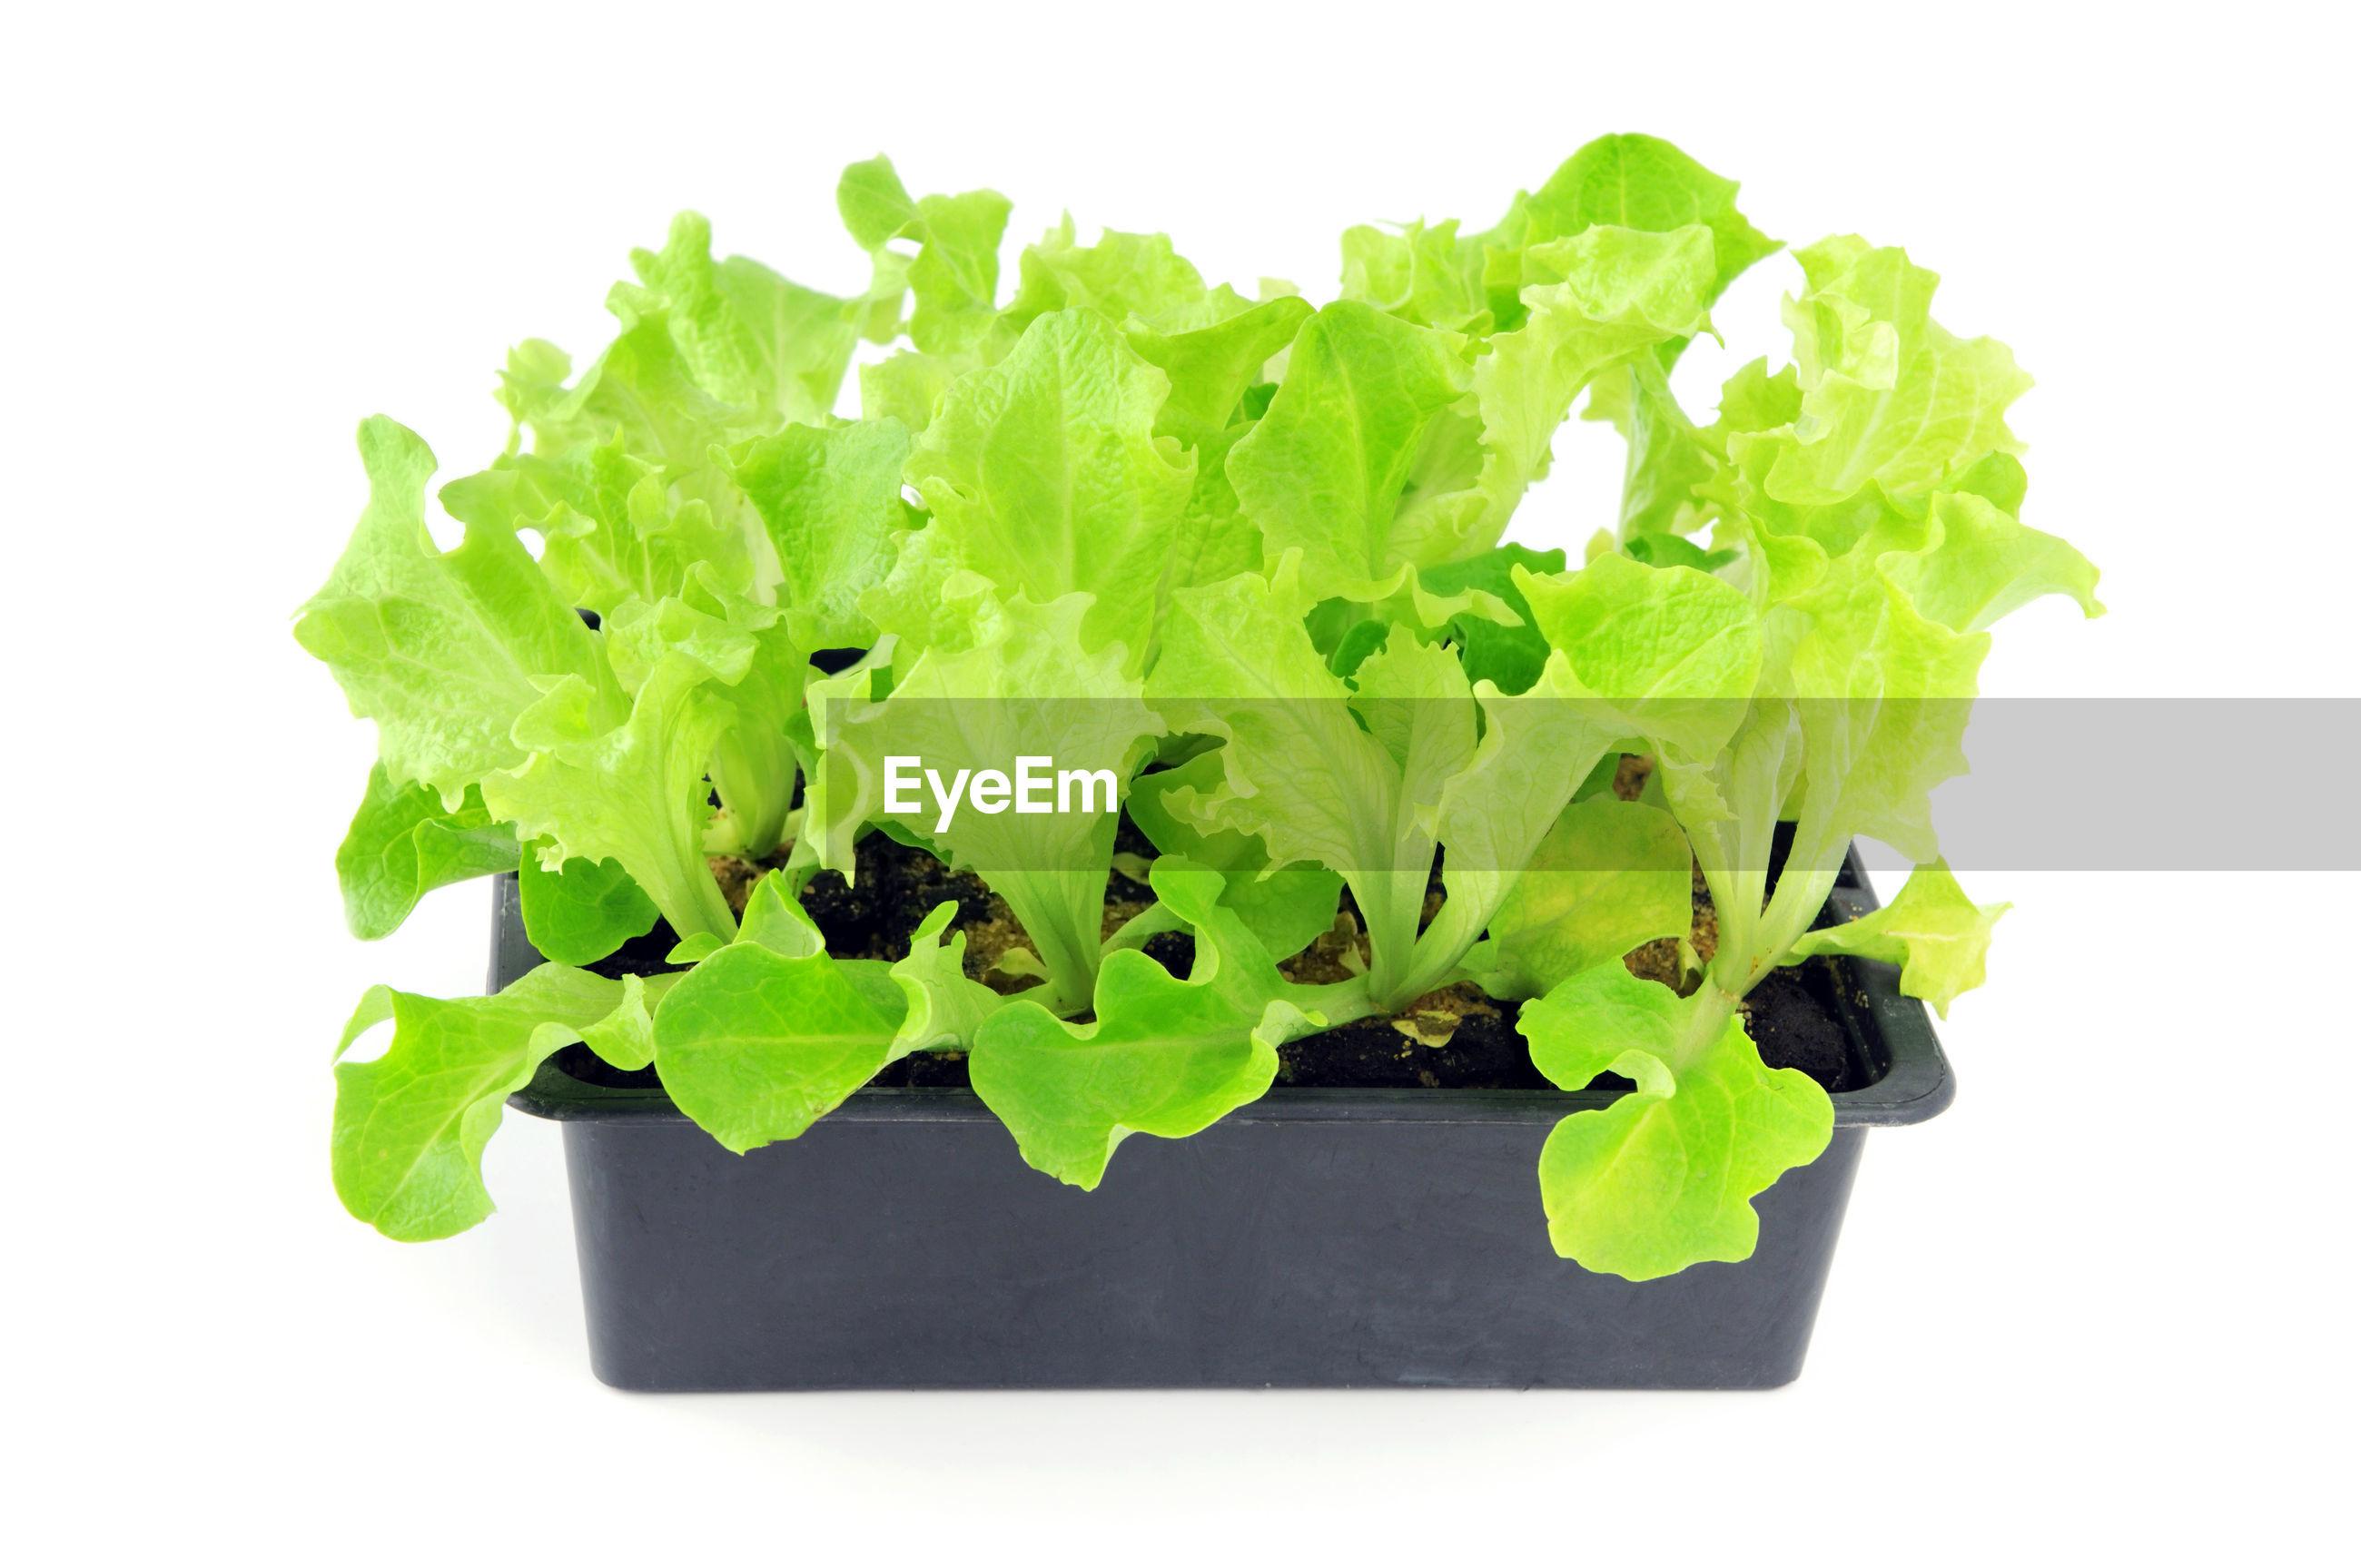 Lettuce seedlings on a tray box against white background